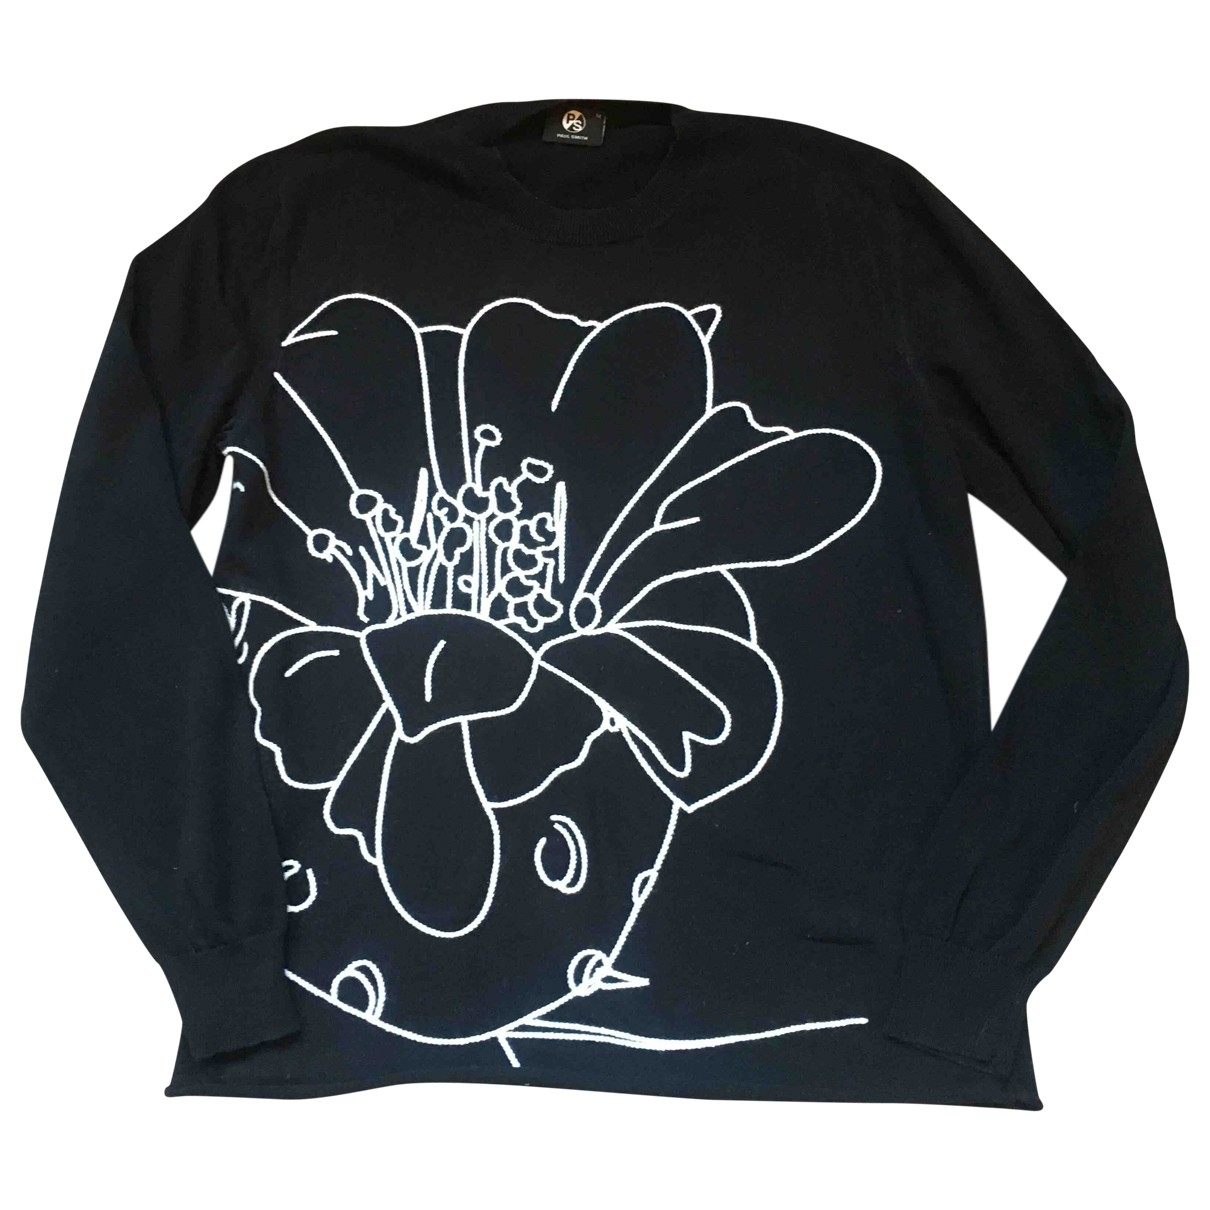 Paul Smith \N Black Cotton Knitwear & Sweatshirts for Men M International